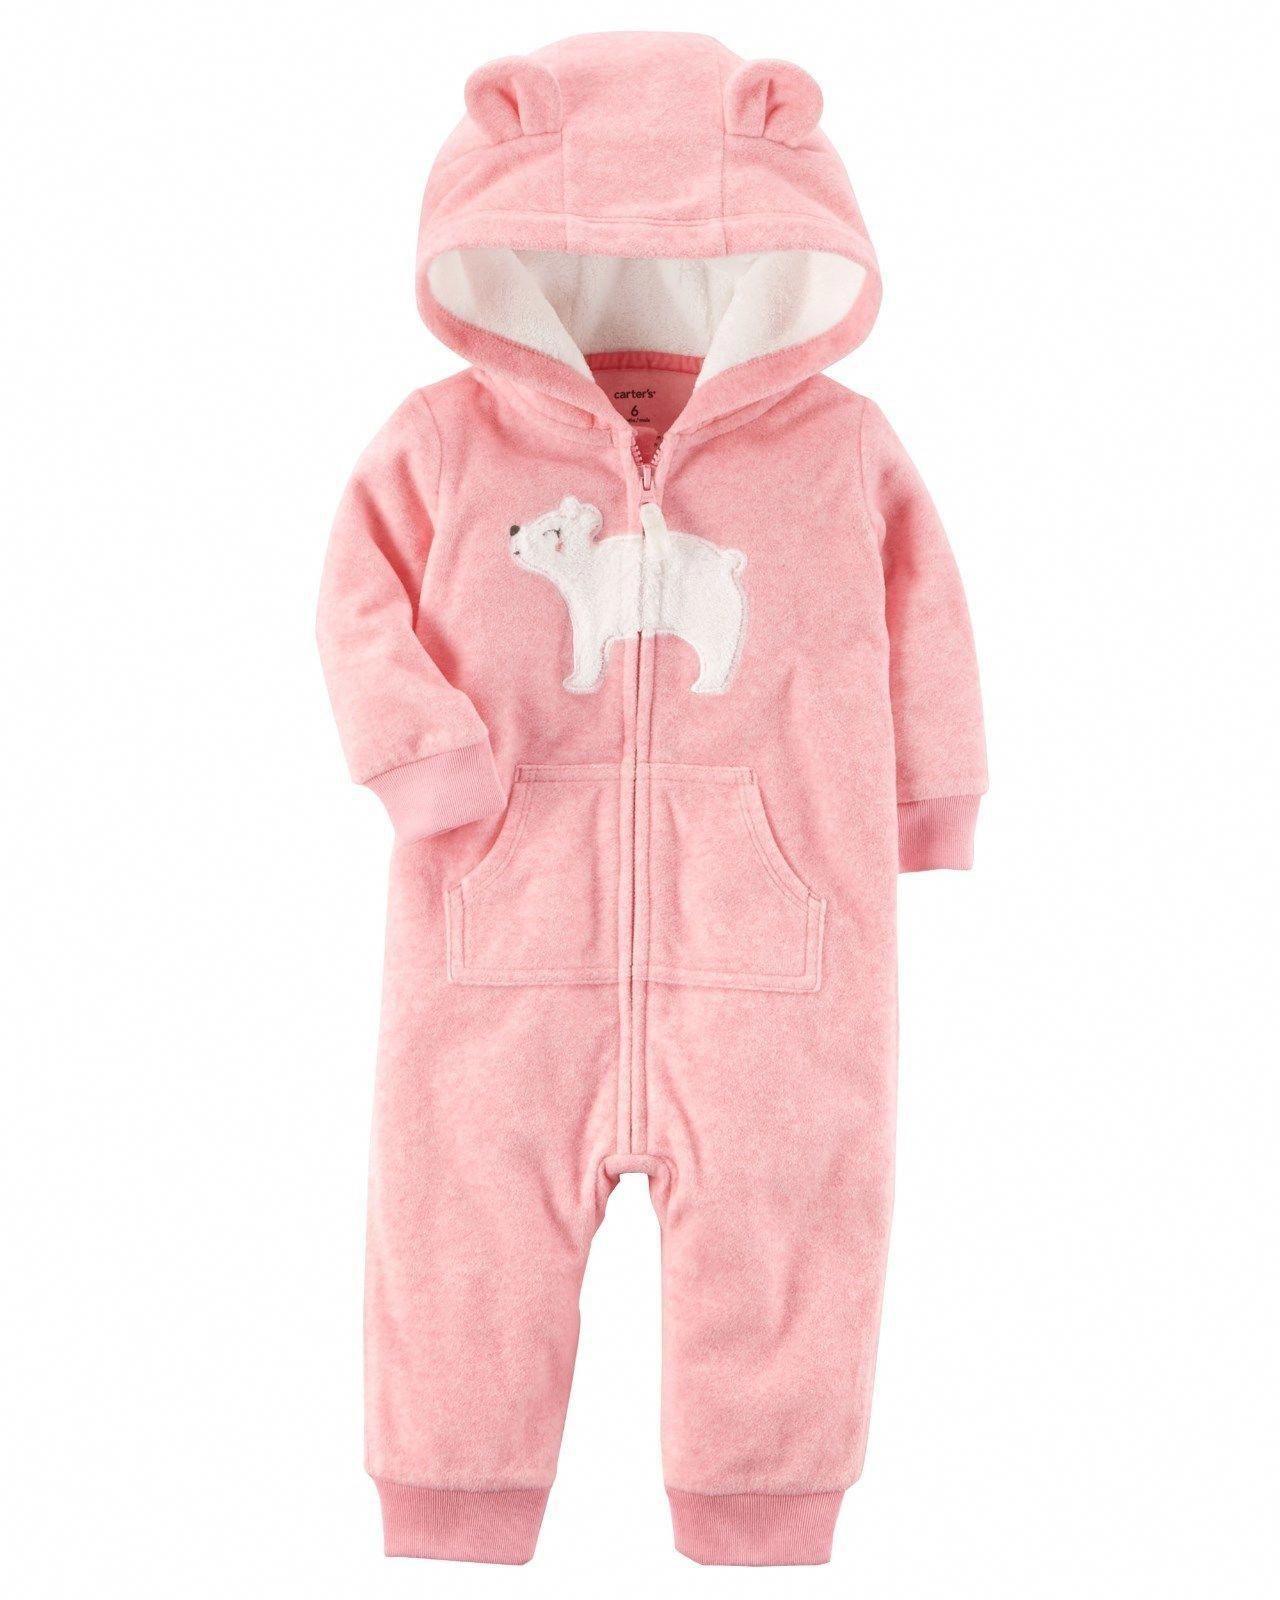 9883be056701 Carter s 1 Piece Fleece Romper Pink Bear Ears Nwt 3M 6M 9M 12M 18 ...